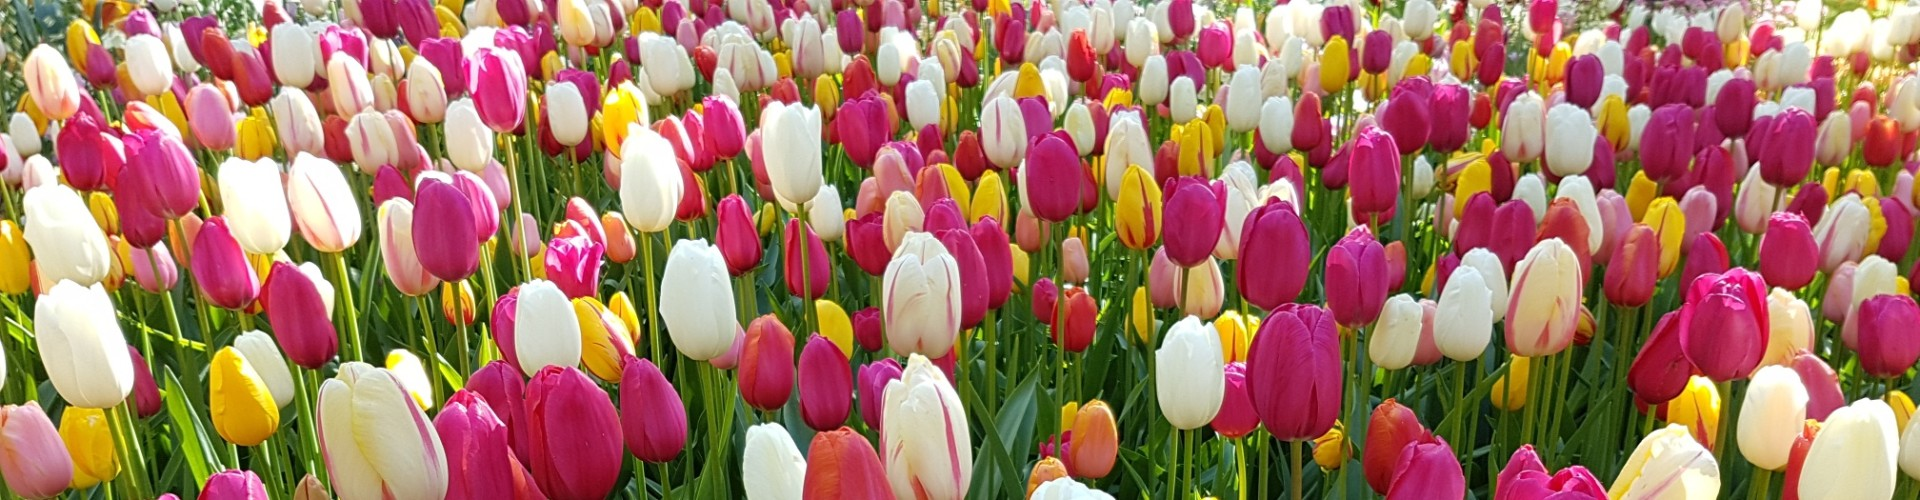 Mixed-Tulips-planted-at-Keukenhof-park